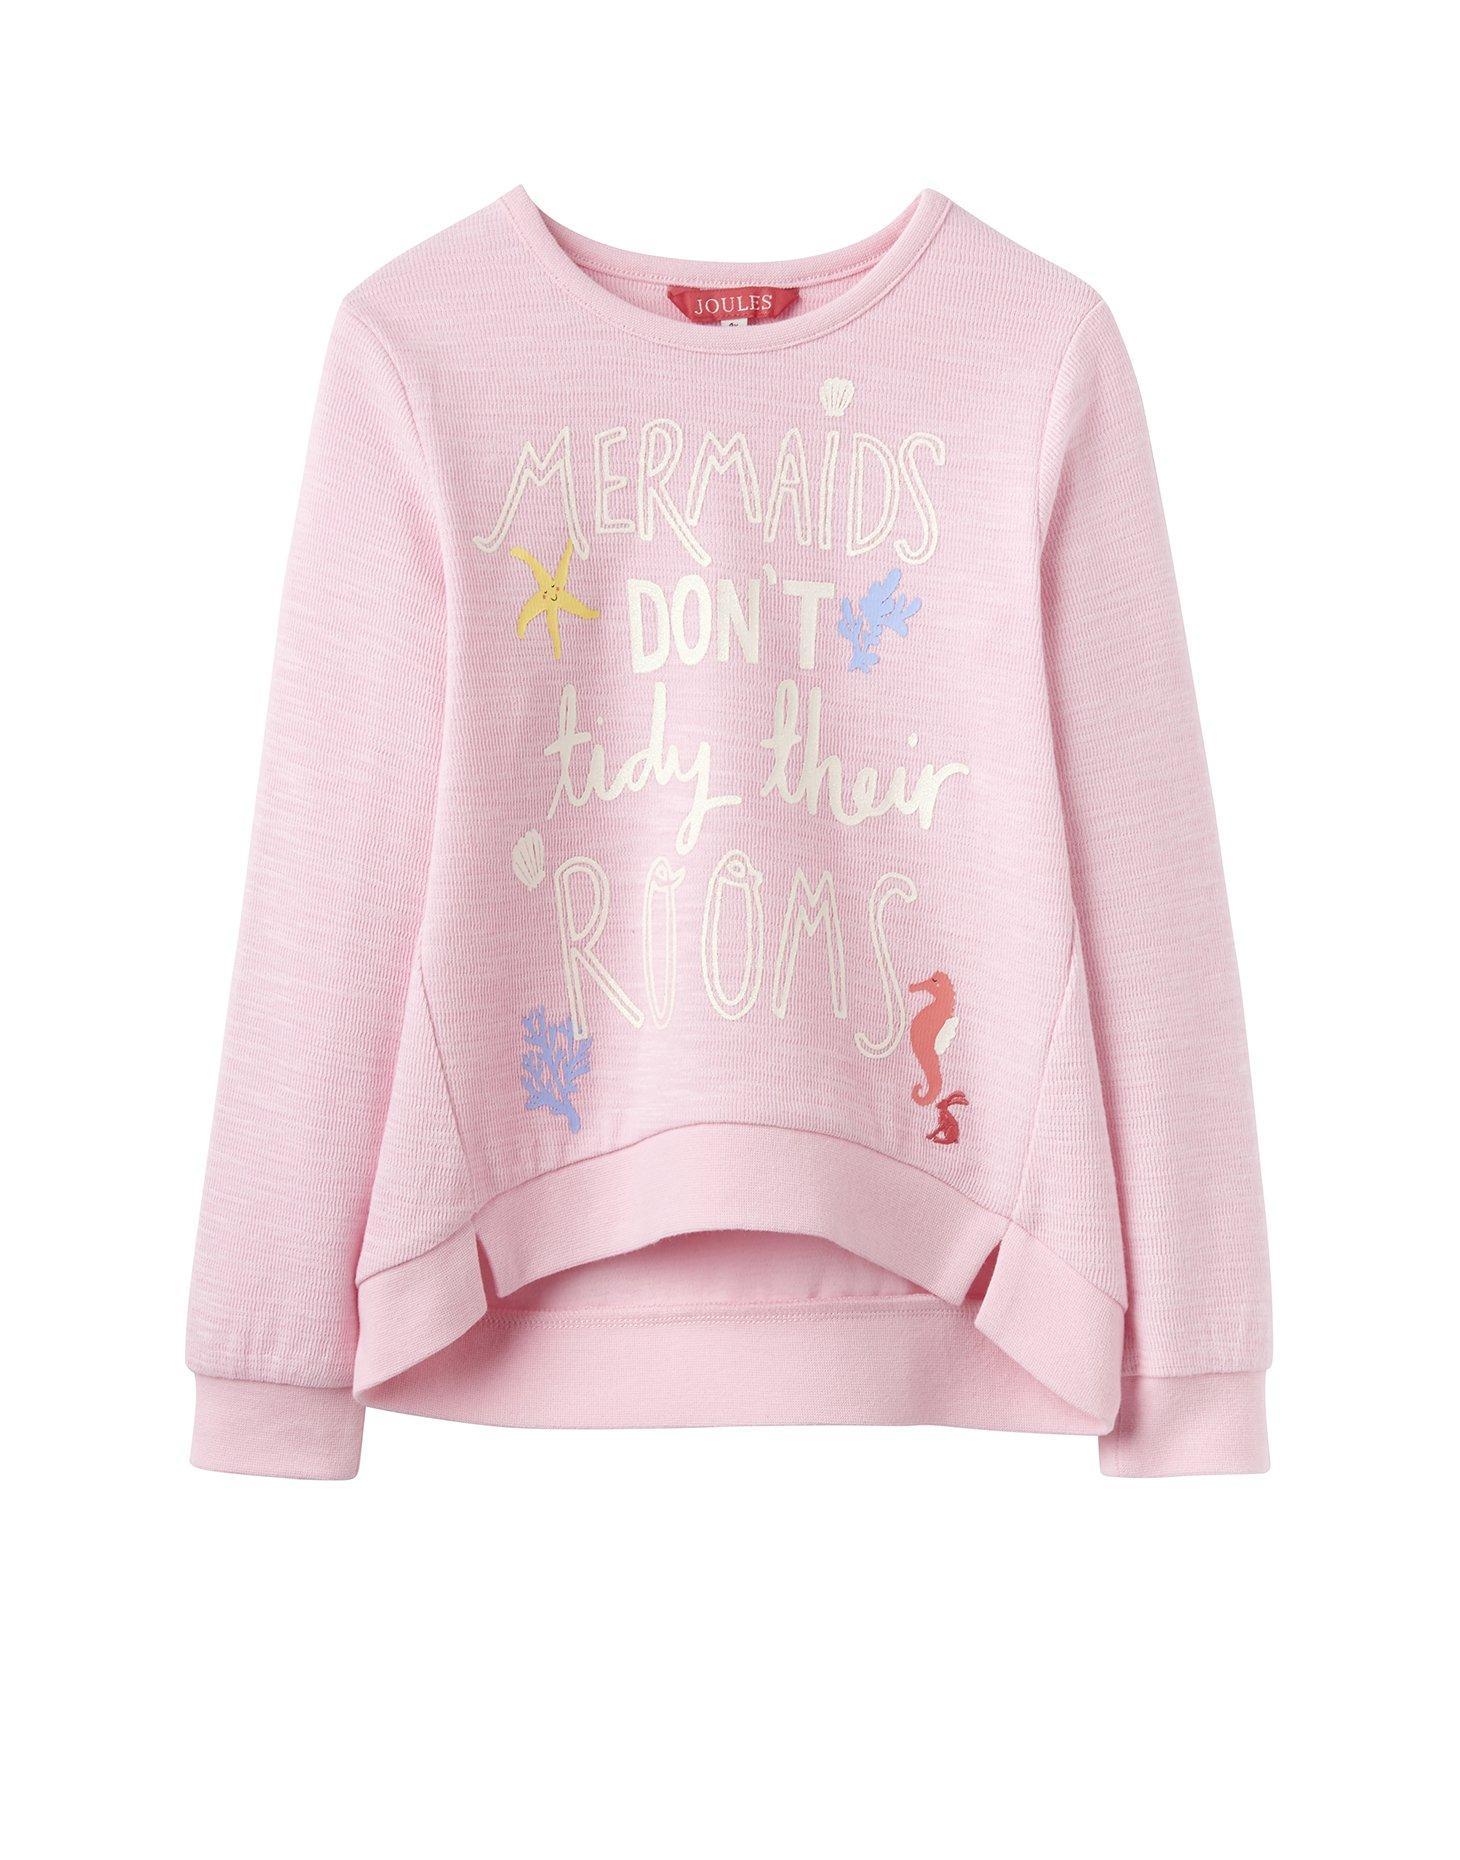 Joules Screen Print Sweatshirt - Rose Pink - 5 Years - 110 cm by Joules